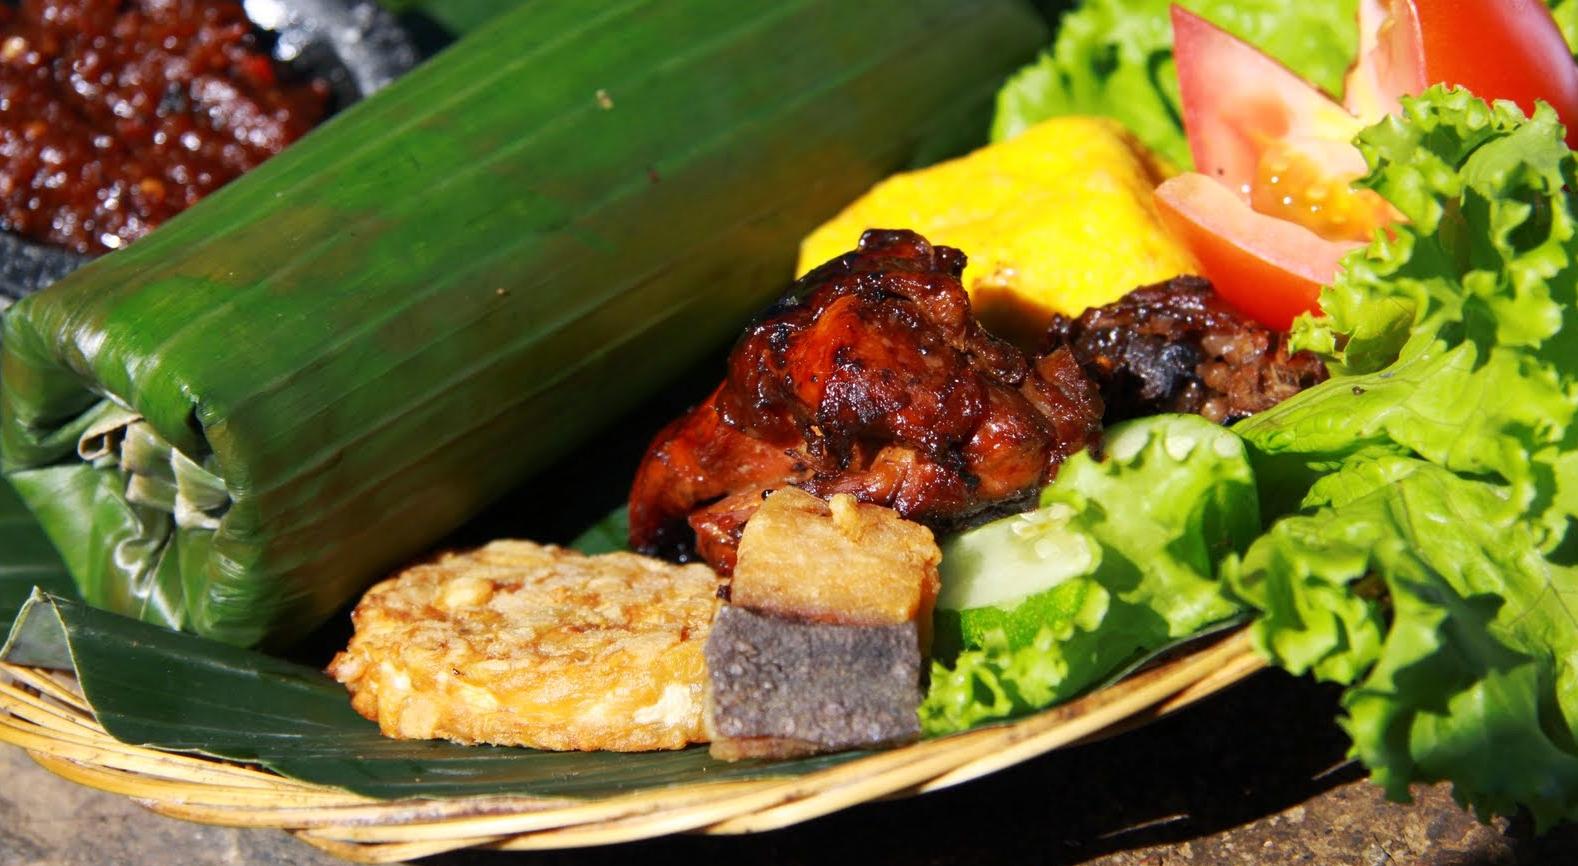 Paket Makan Siang Di Floating Market Untuk Rombongan Tiket Masuk Lembang Ilustrasi Bandung 2017